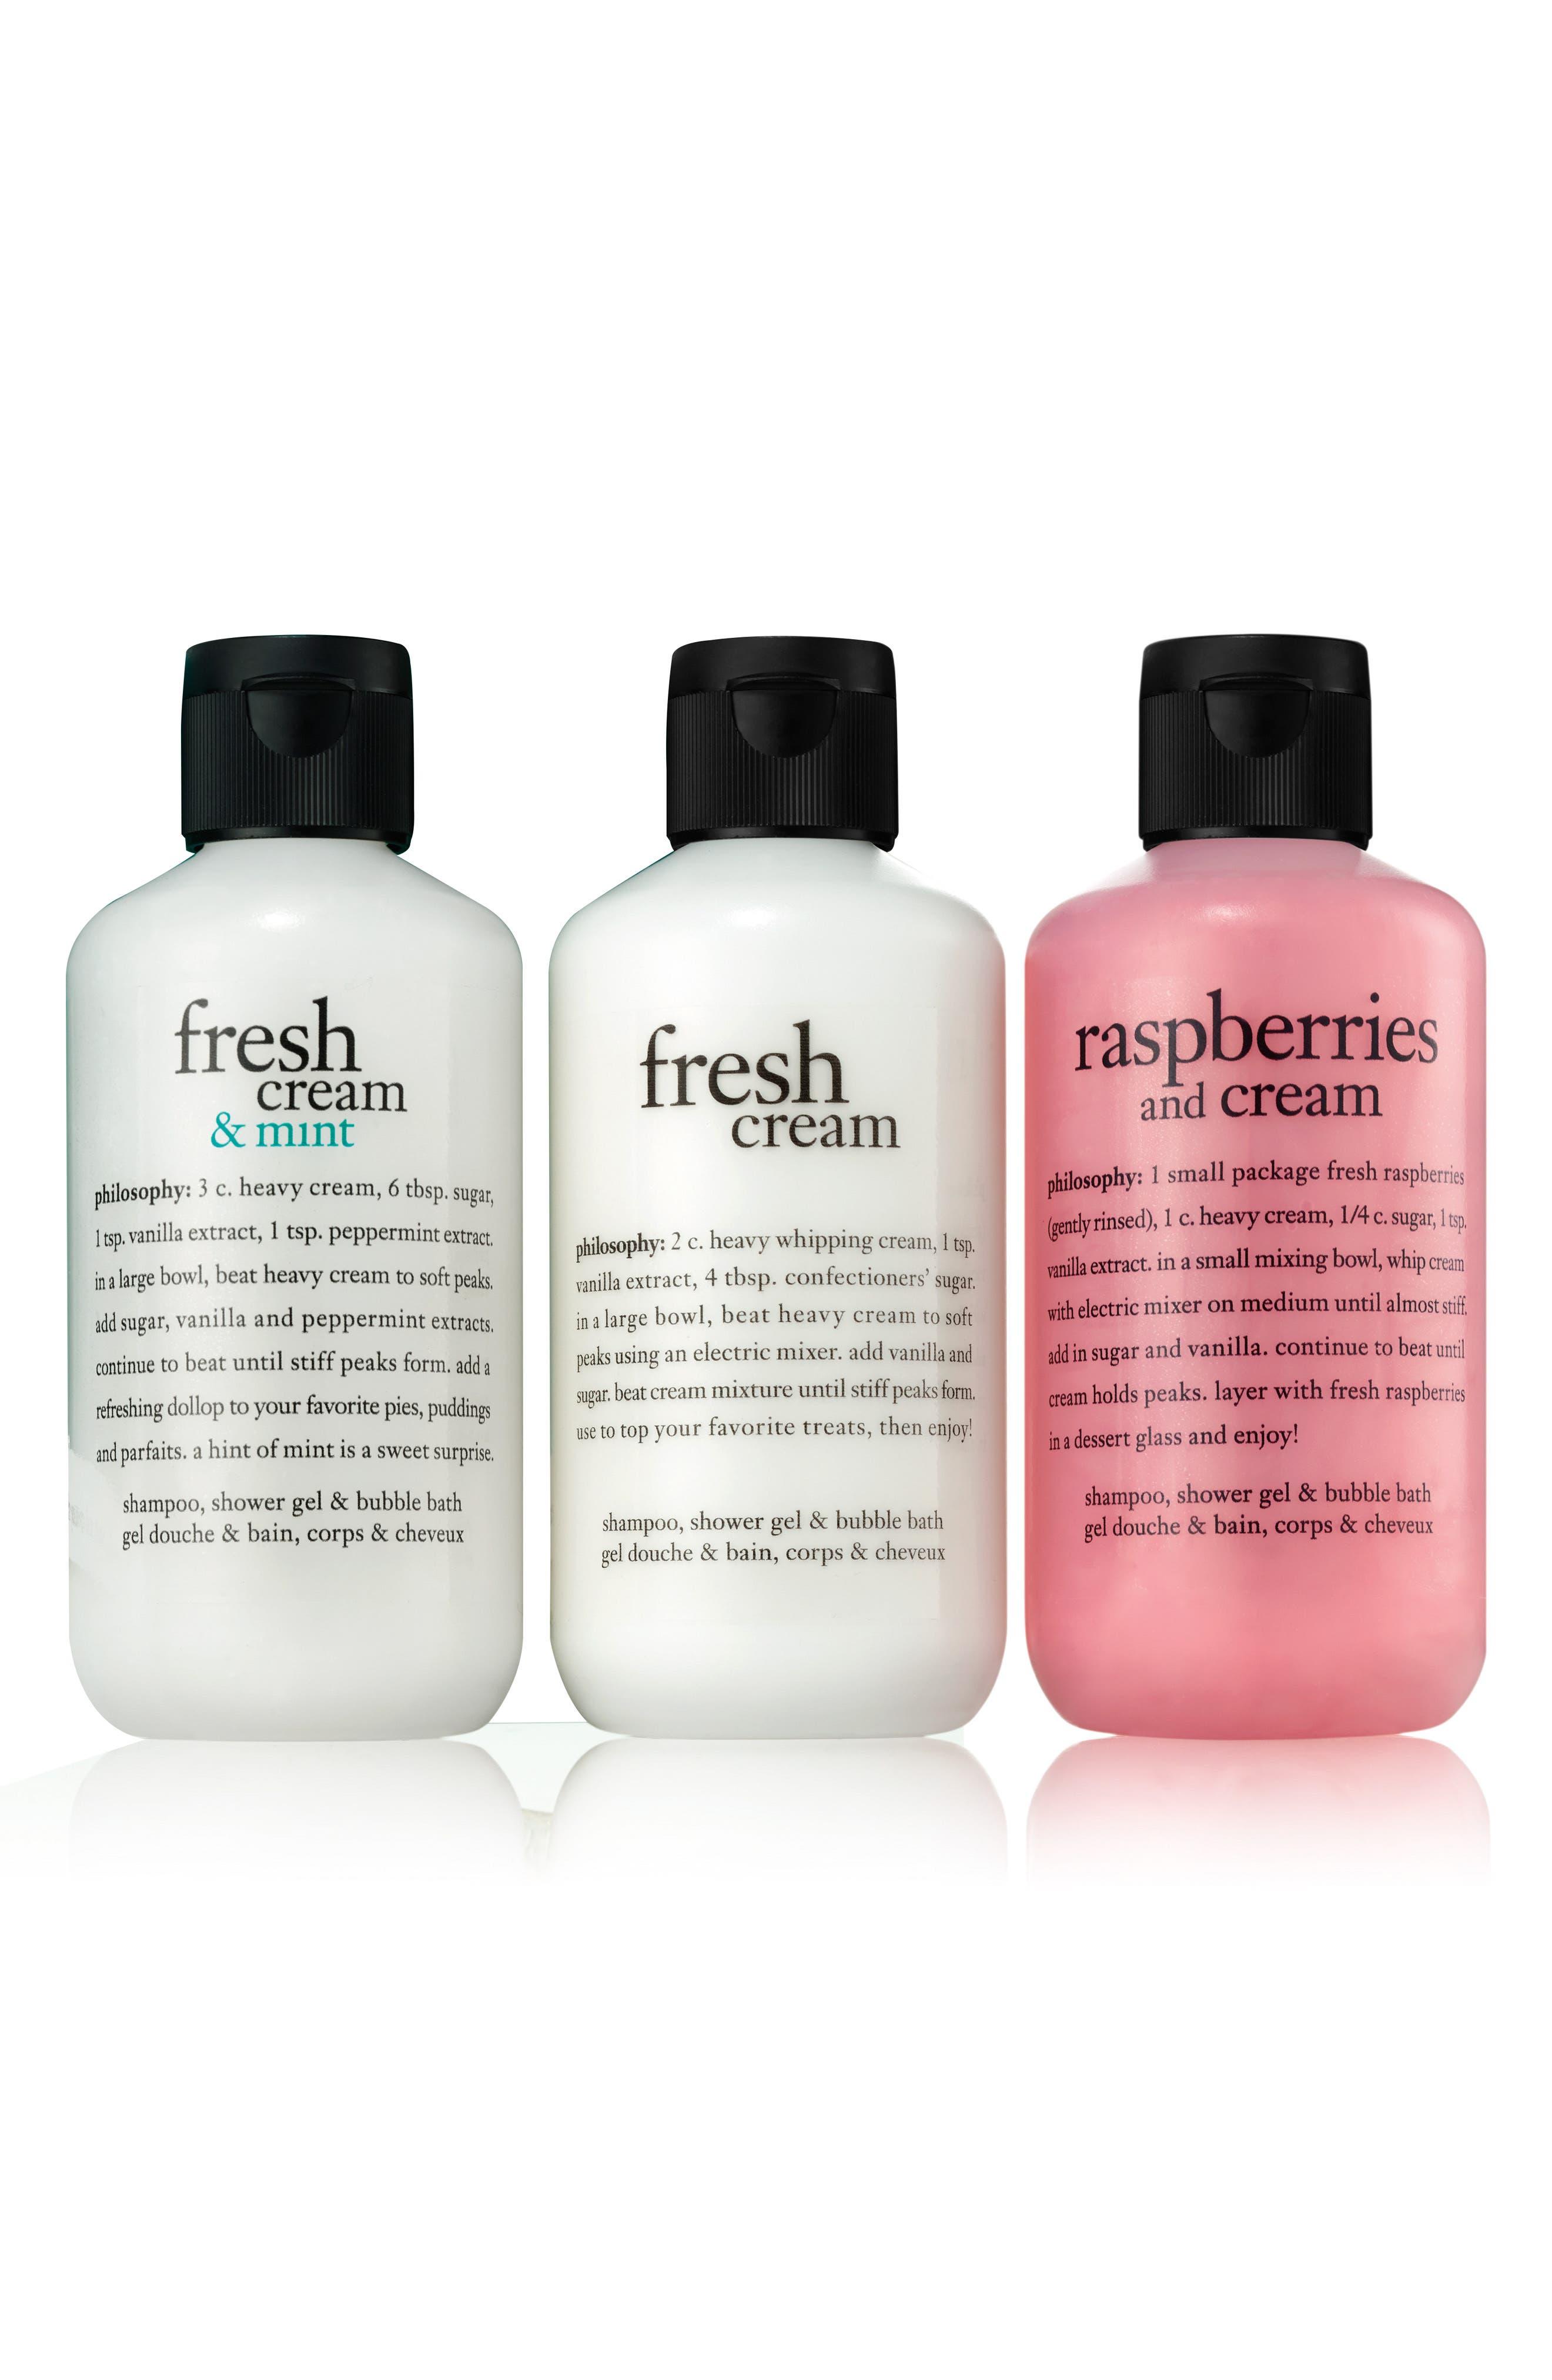 fresh cream shampoo, shower gel & bubble bath trio,                             Alternate thumbnail 2, color,                             No Color